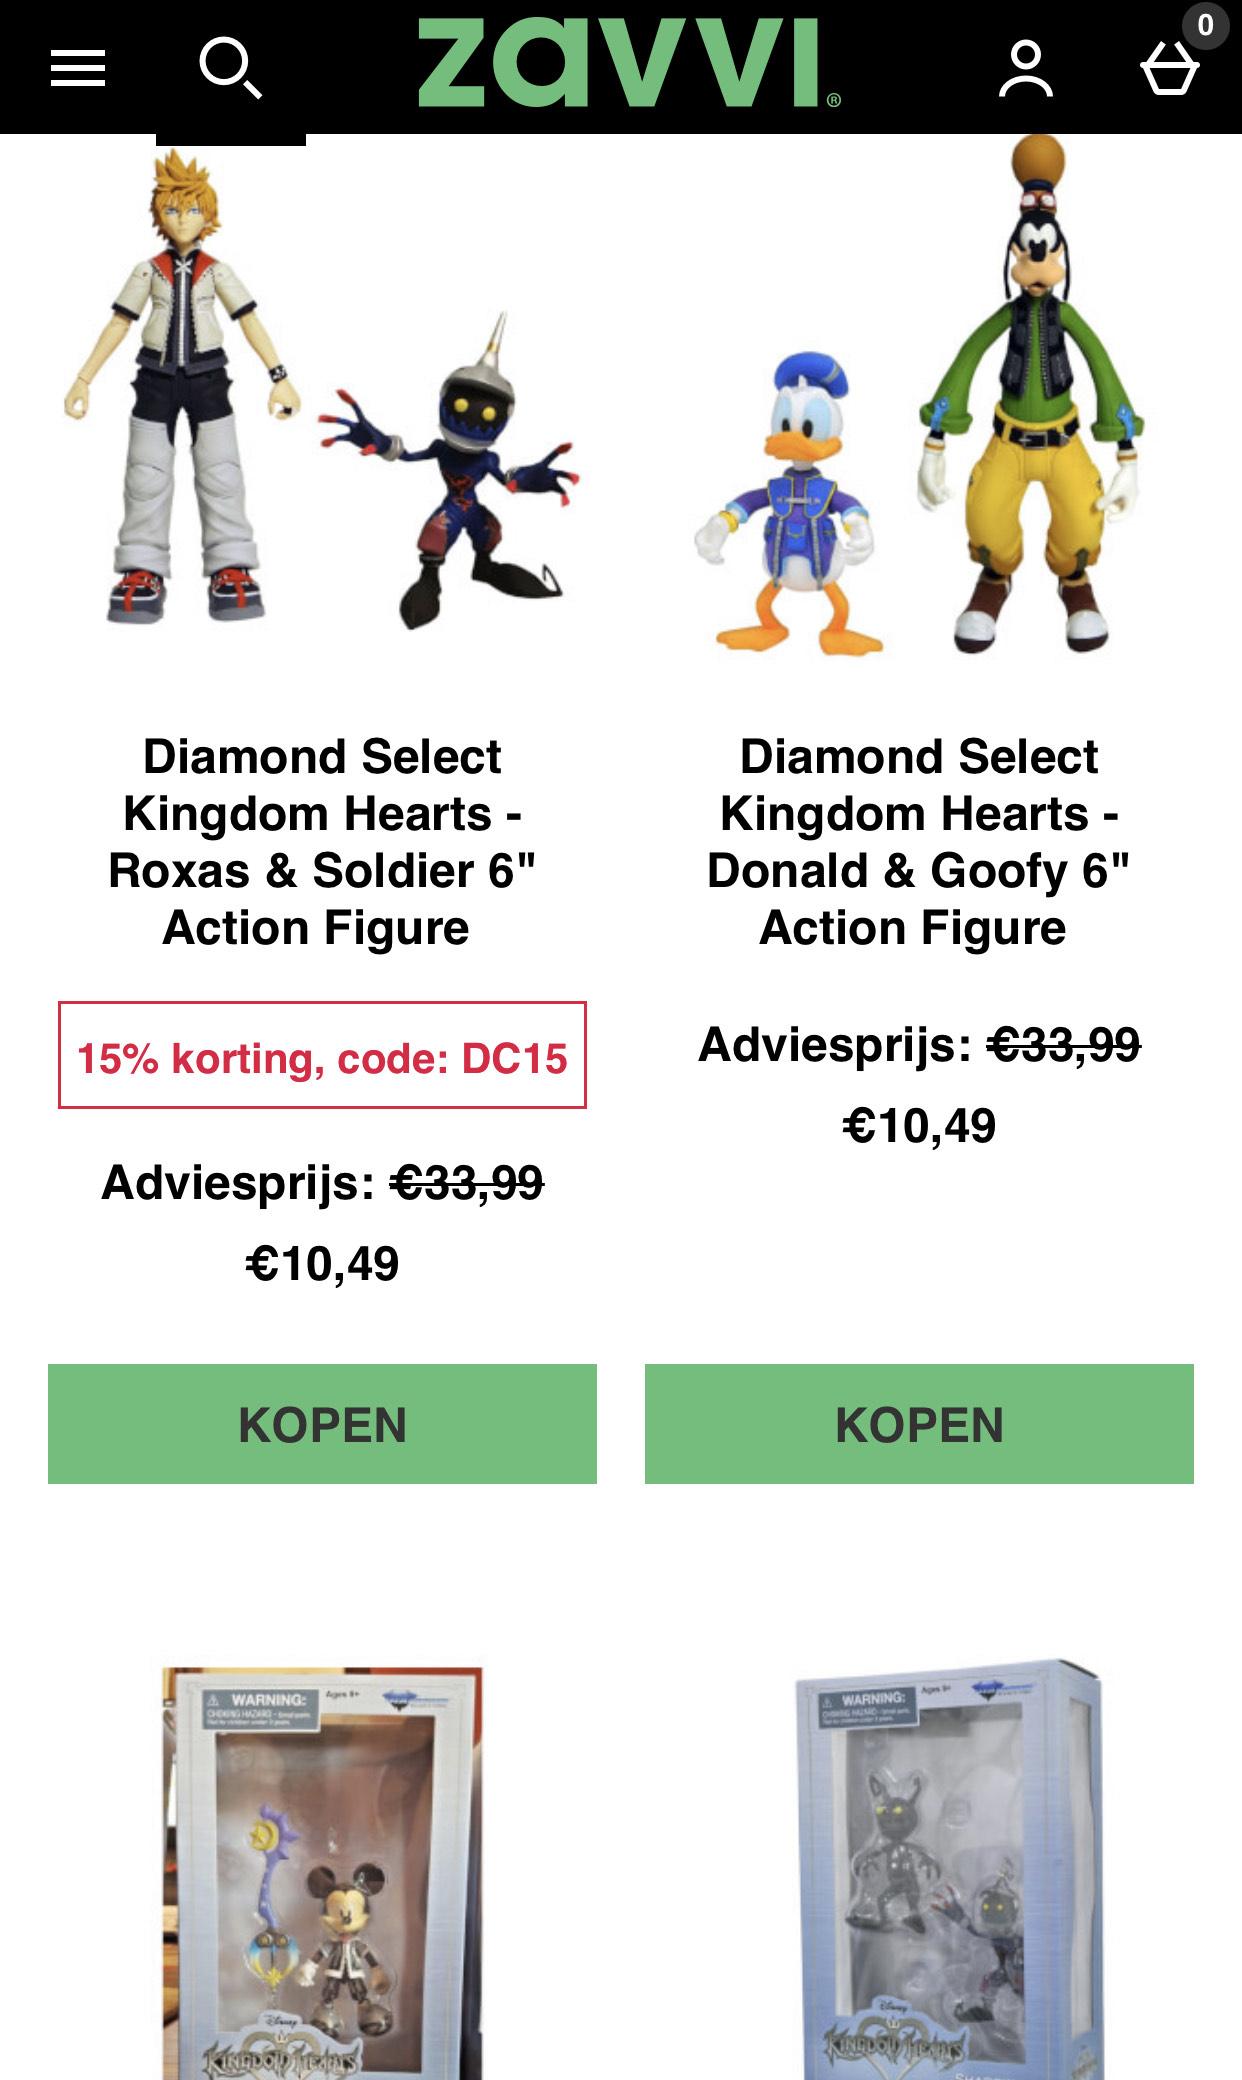 Diamond Select Kingdom Hearts Action Figures